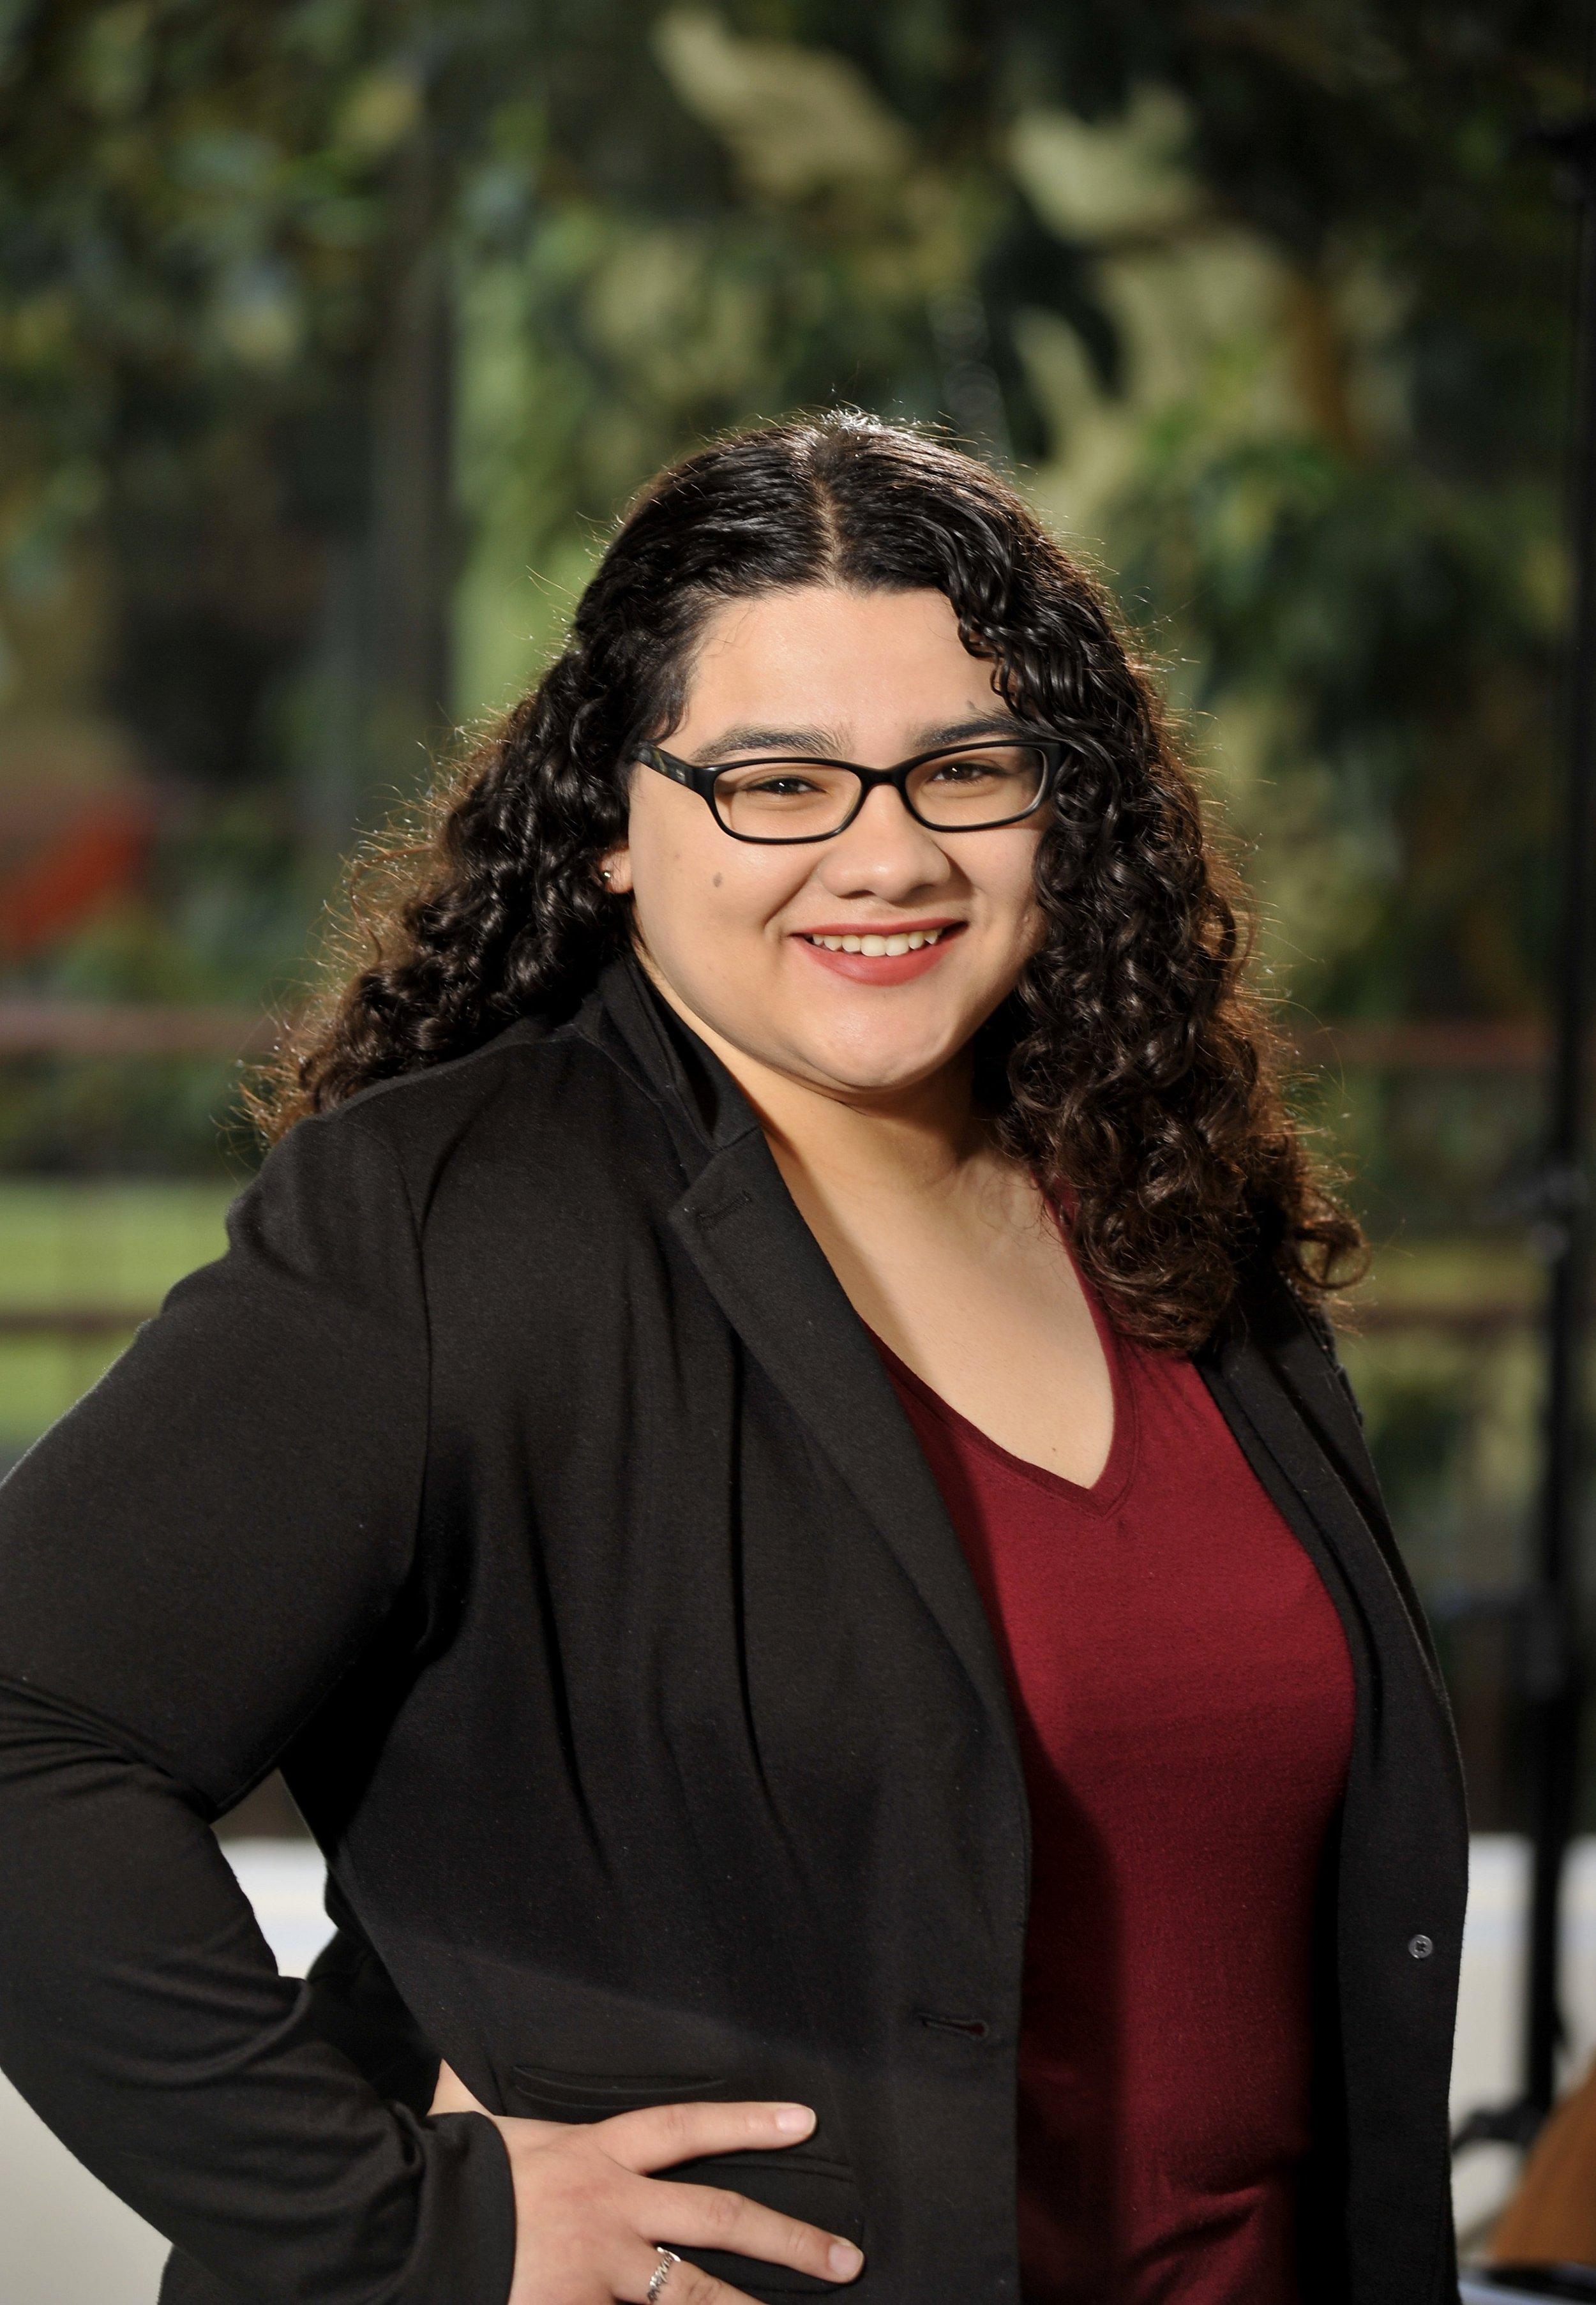 Vanessa Monroy, MSWFamily Team Manager - vanessa@imaginela.org